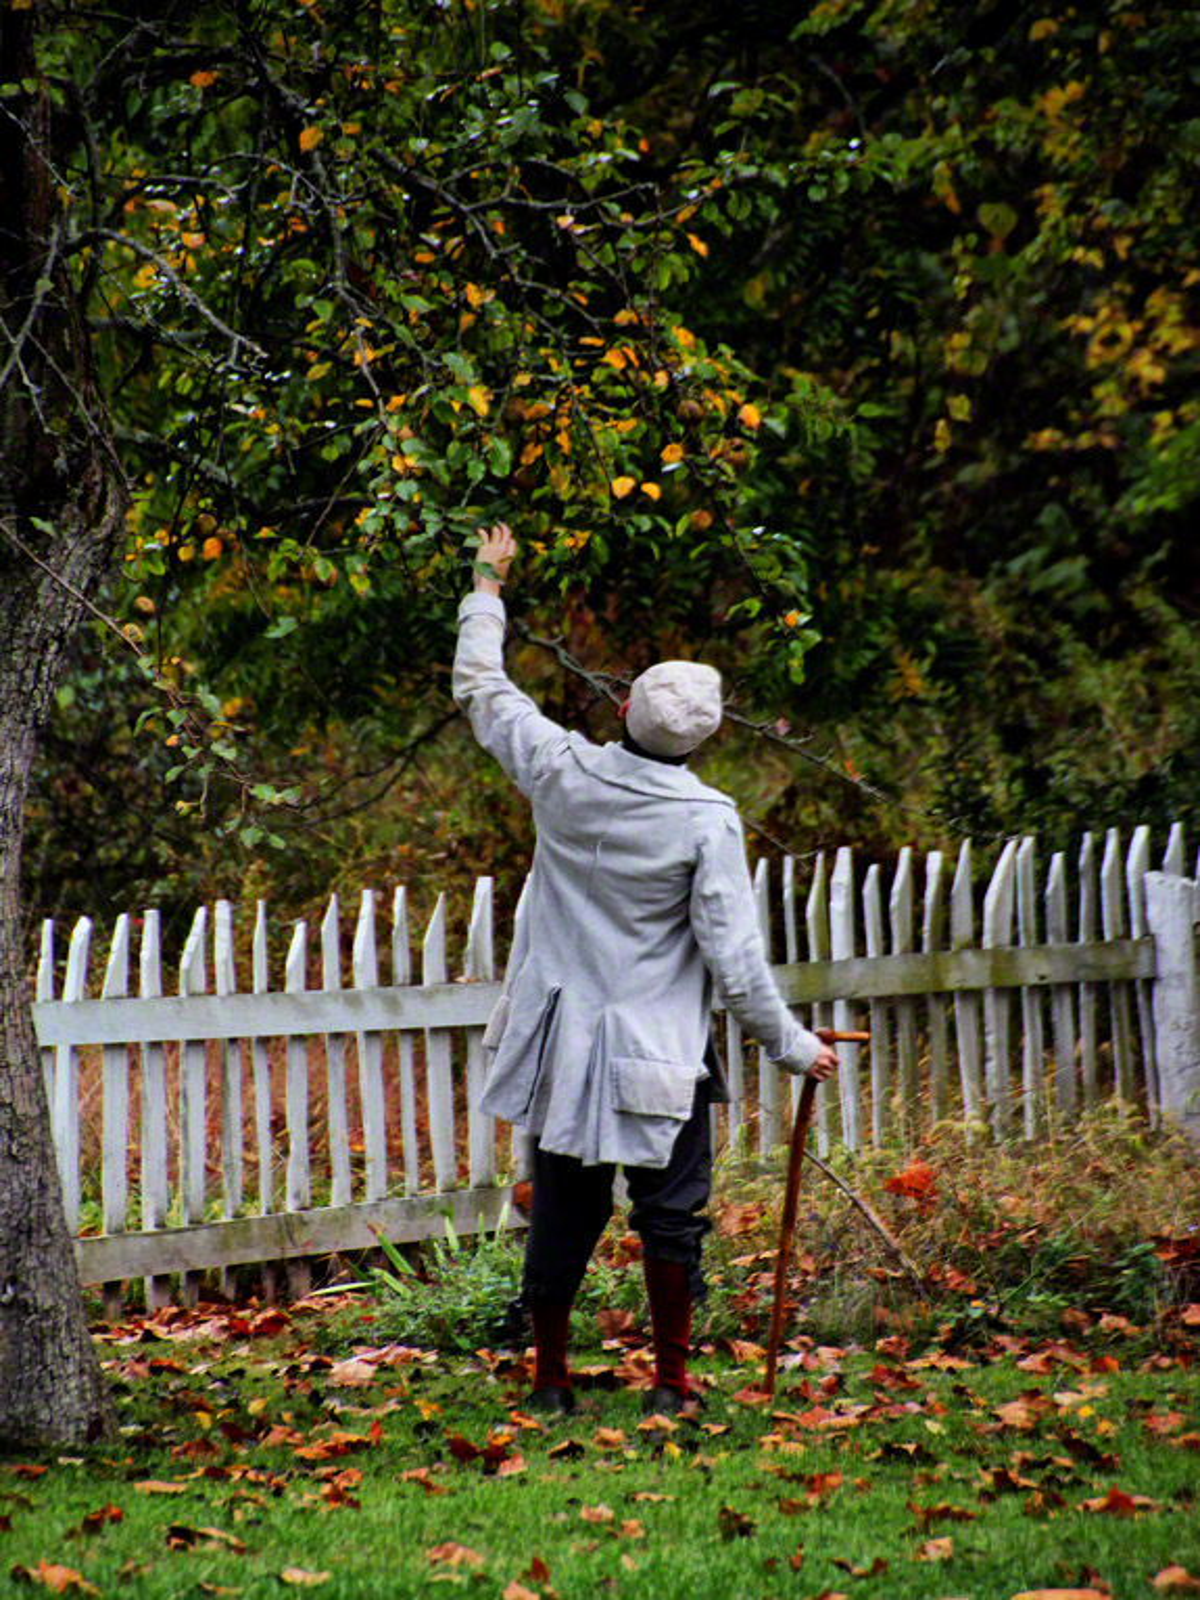 birdsboro, pennsylvania, mysterious, person, apple, harvest,, photo